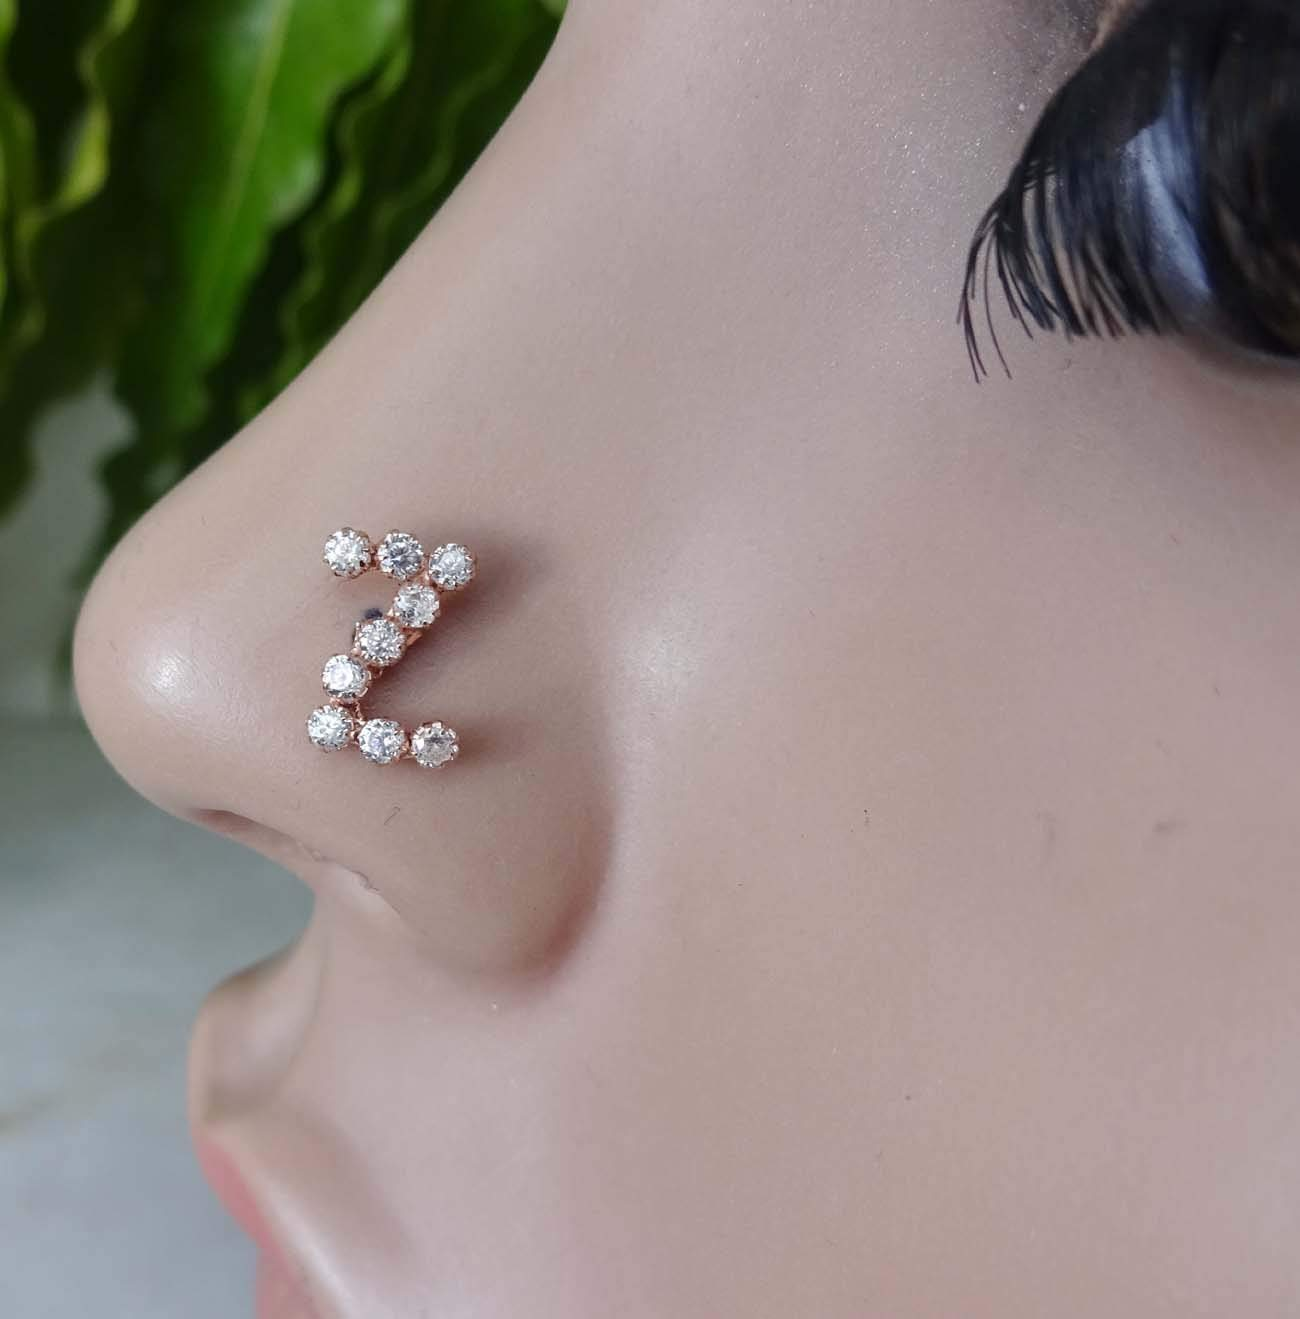 Cubic Zirconia,Alphabet Piercing,Indian Nose Stud,Opal Nose Ring,14K Gold Piercing,Crock Screw Nose Stud,Nose Piercing,Personalized Nose Stud,Sterling Silver Personalized Initial Piercing ( TEJ484)